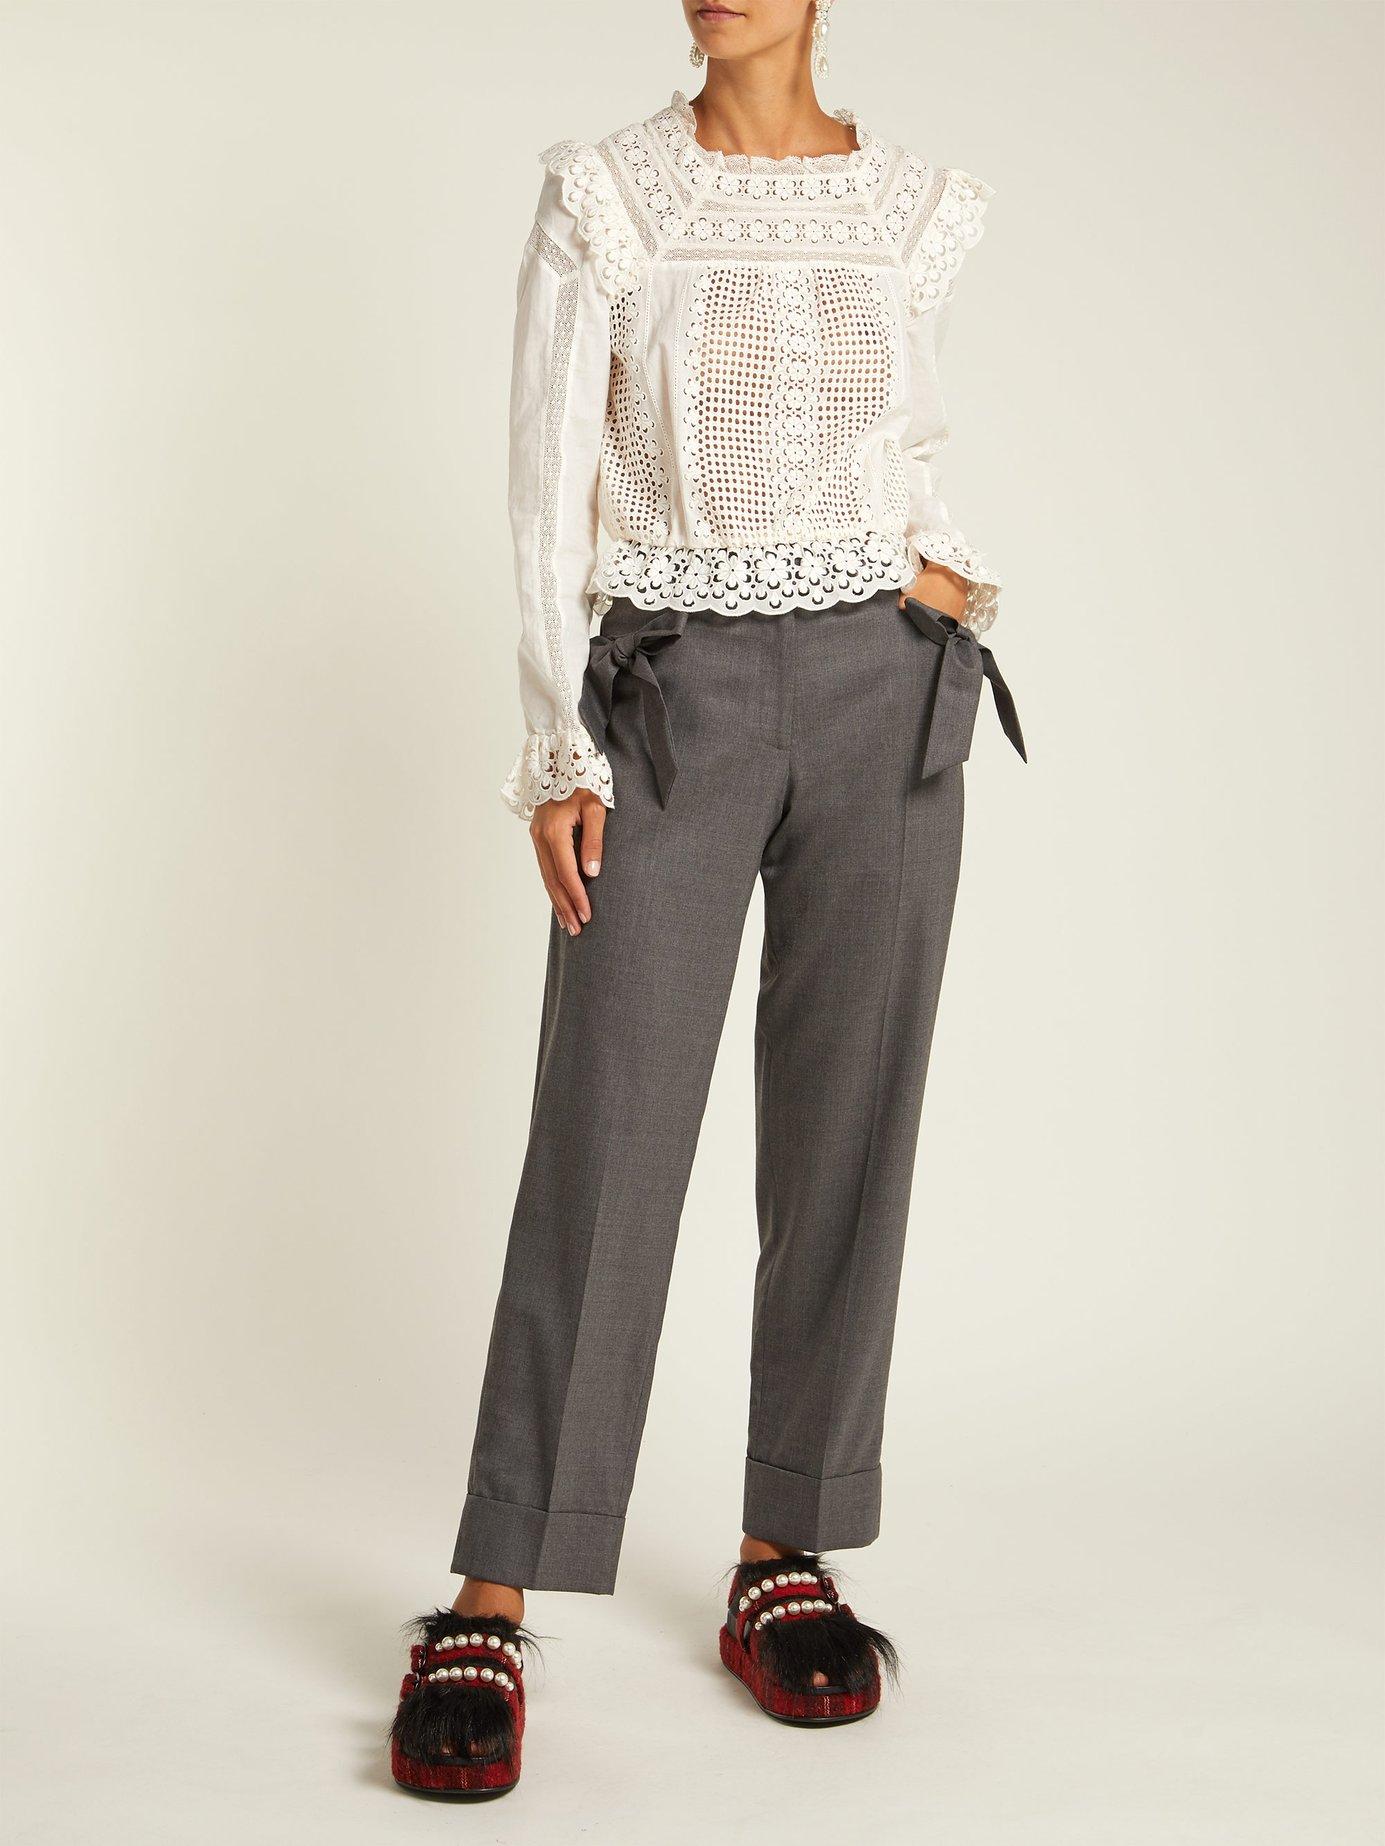 Embellished tartan tweed platform sandals by Simone Rocha